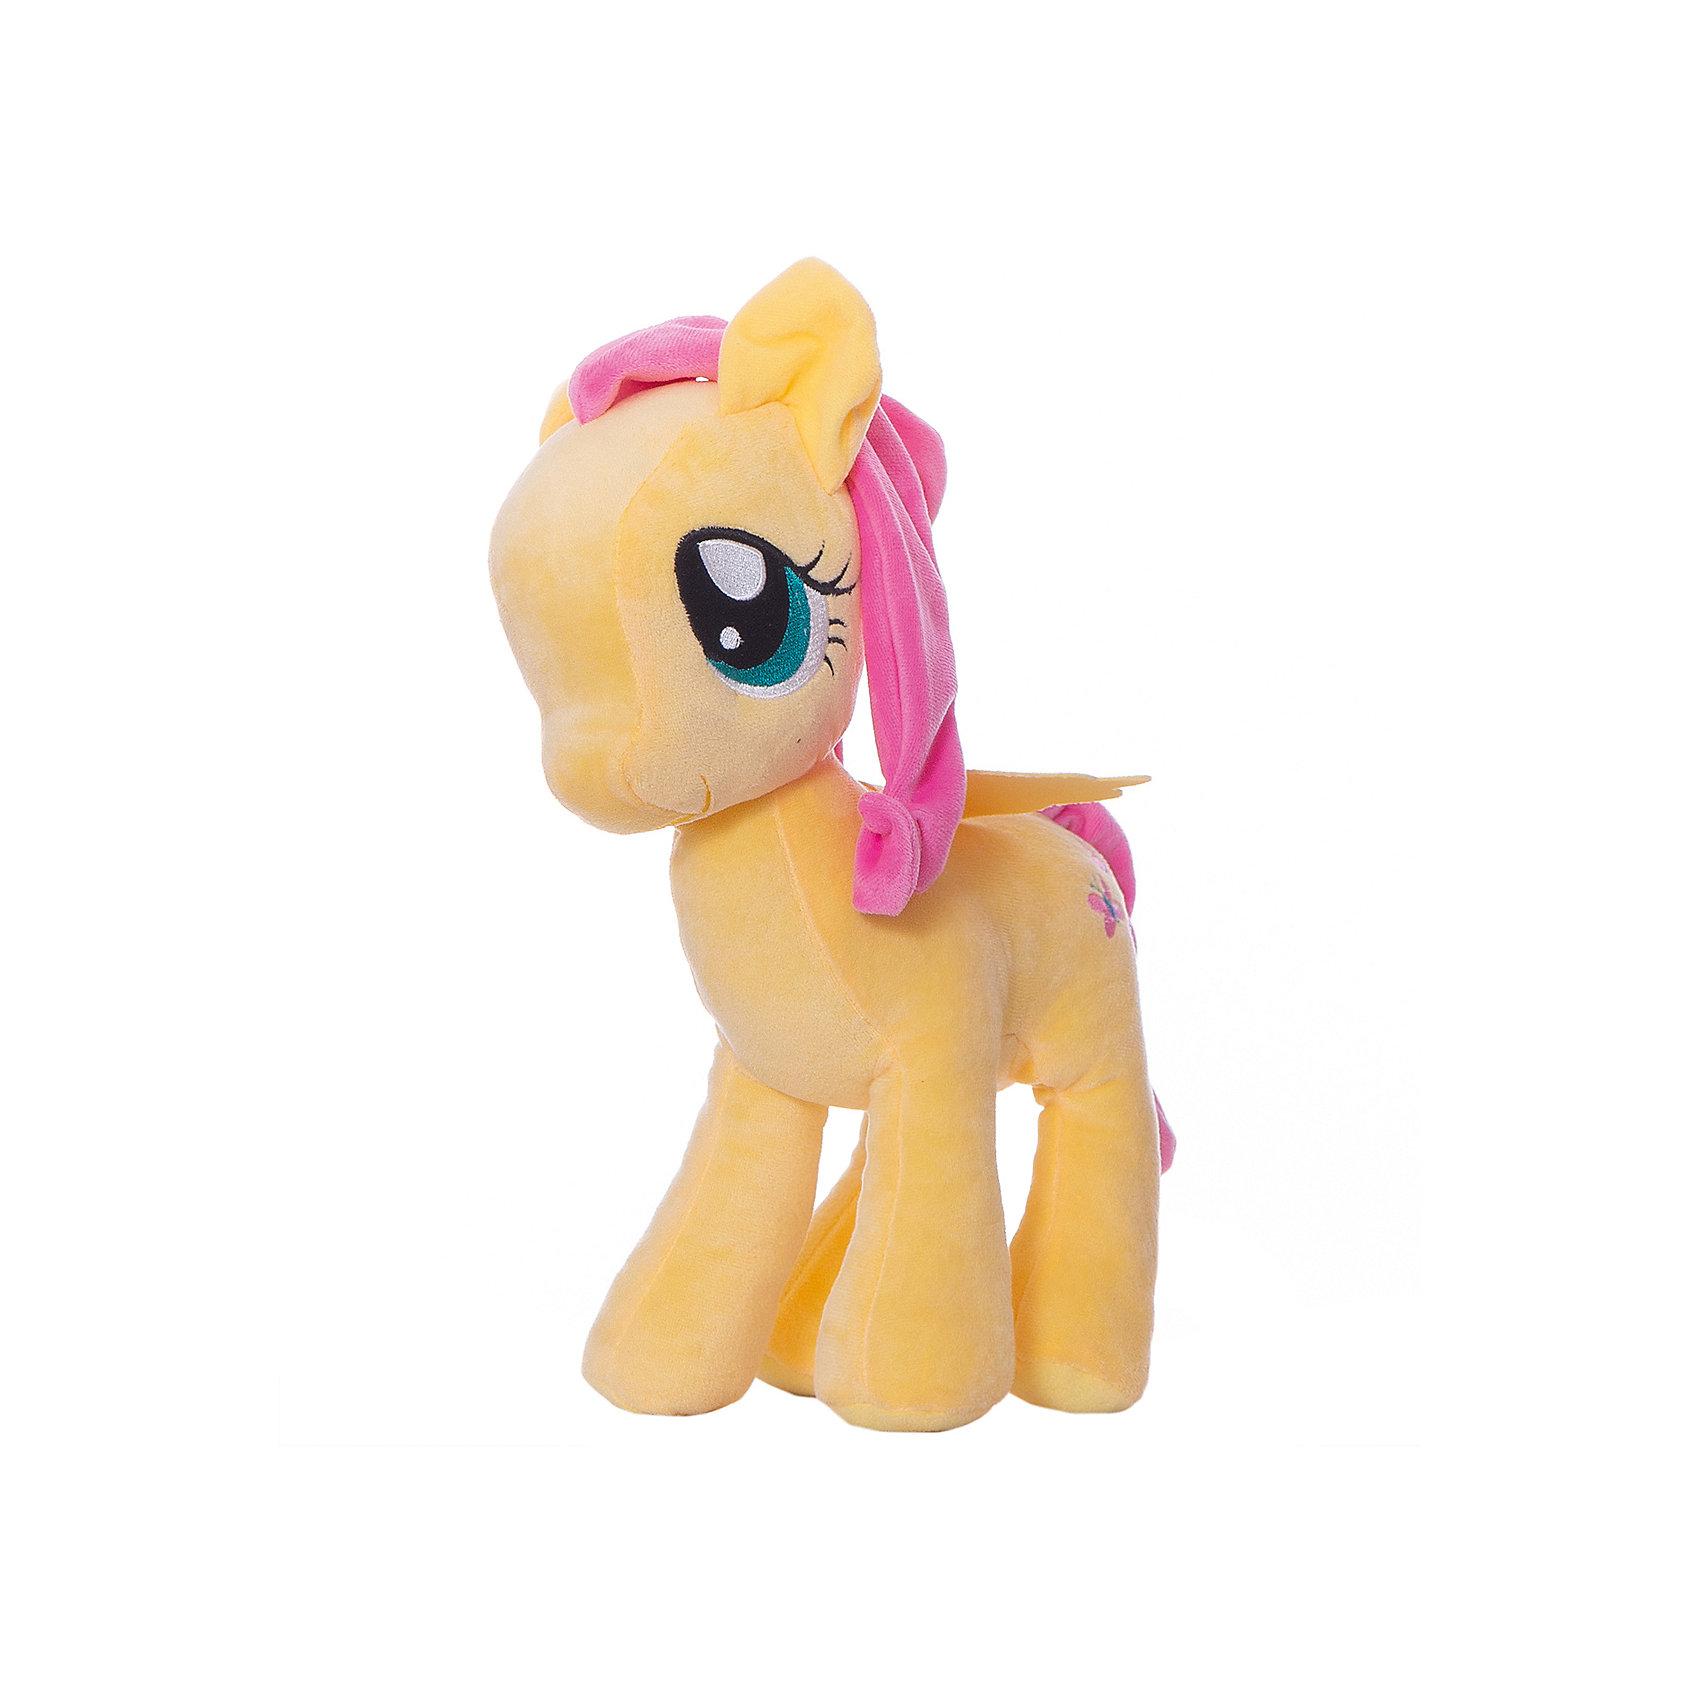 Плюшевые пони, B9817/C0117, My little Pony, HasbroЛюбимые герои<br><br><br>Ширина мм: 89<br>Глубина мм: 203<br>Высота мм: 305<br>Вес г: 259<br>Возраст от месяцев: 36<br>Возраст до месяцев: 84<br>Пол: Женский<br>Возраст: Детский<br>SKU: 6861723